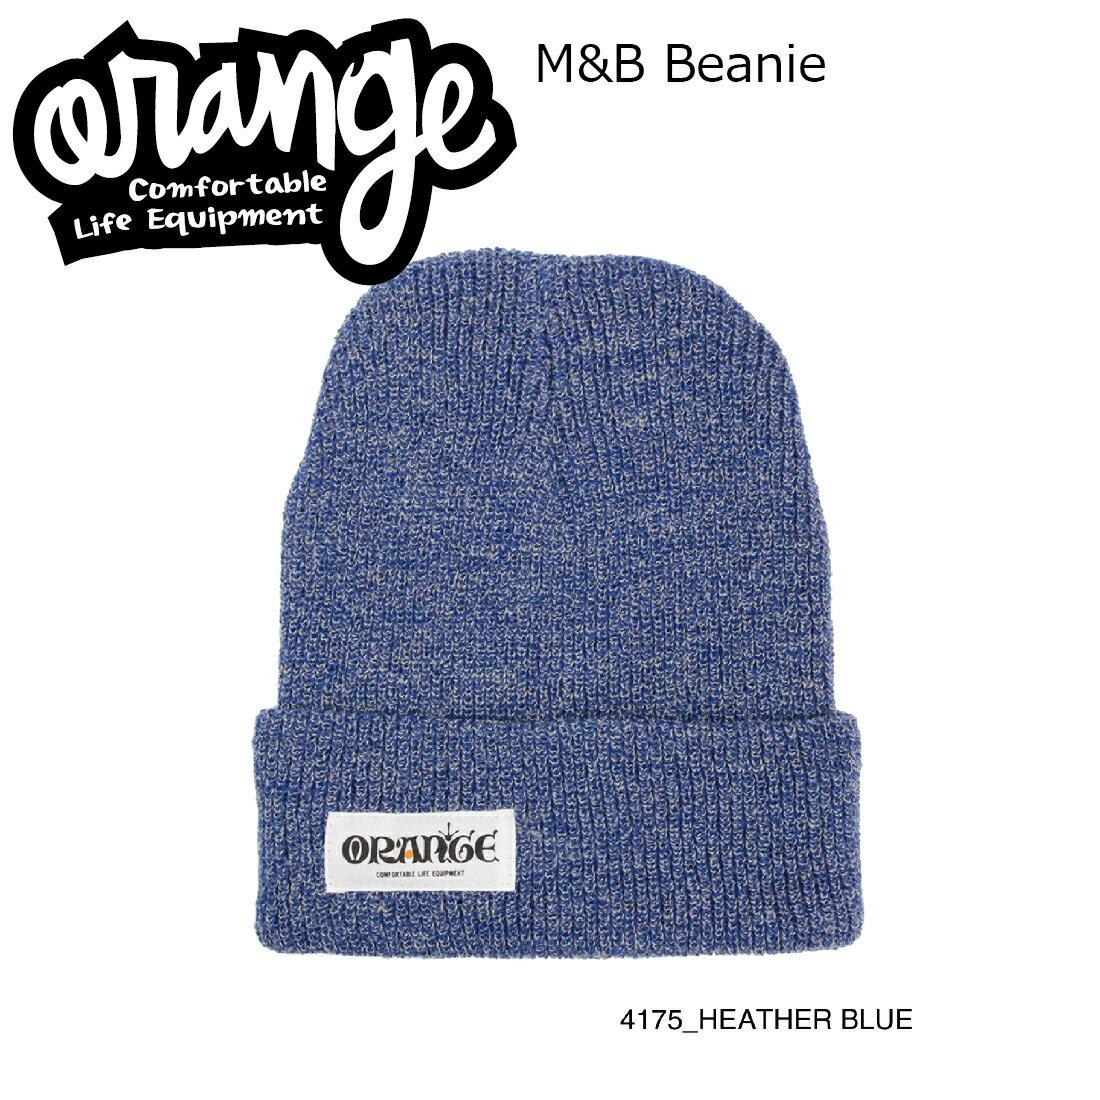 Oran'ge M&B Beanie 4175 HEATHER BLUE オレンジ エムアンドビー ビーニー ニットキャップ 2つ折り